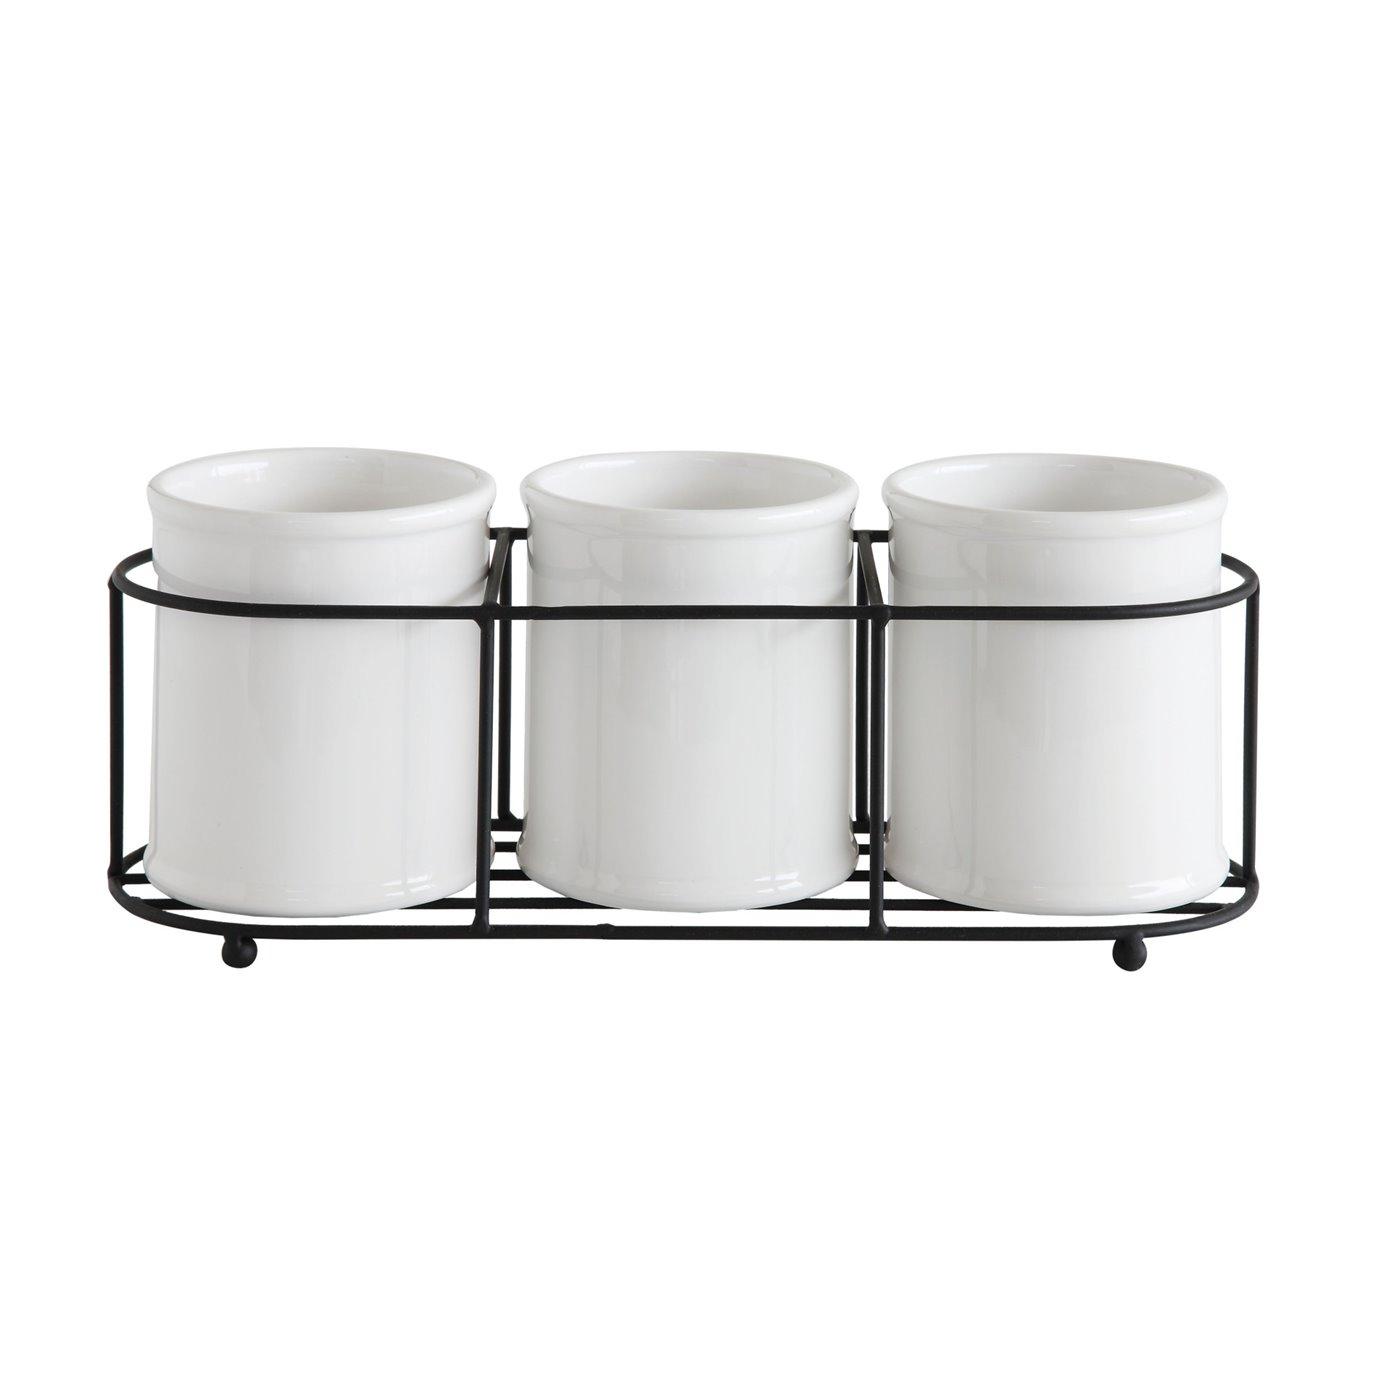 Set of 3 White Ceramic Crocks in Black Metal Holder